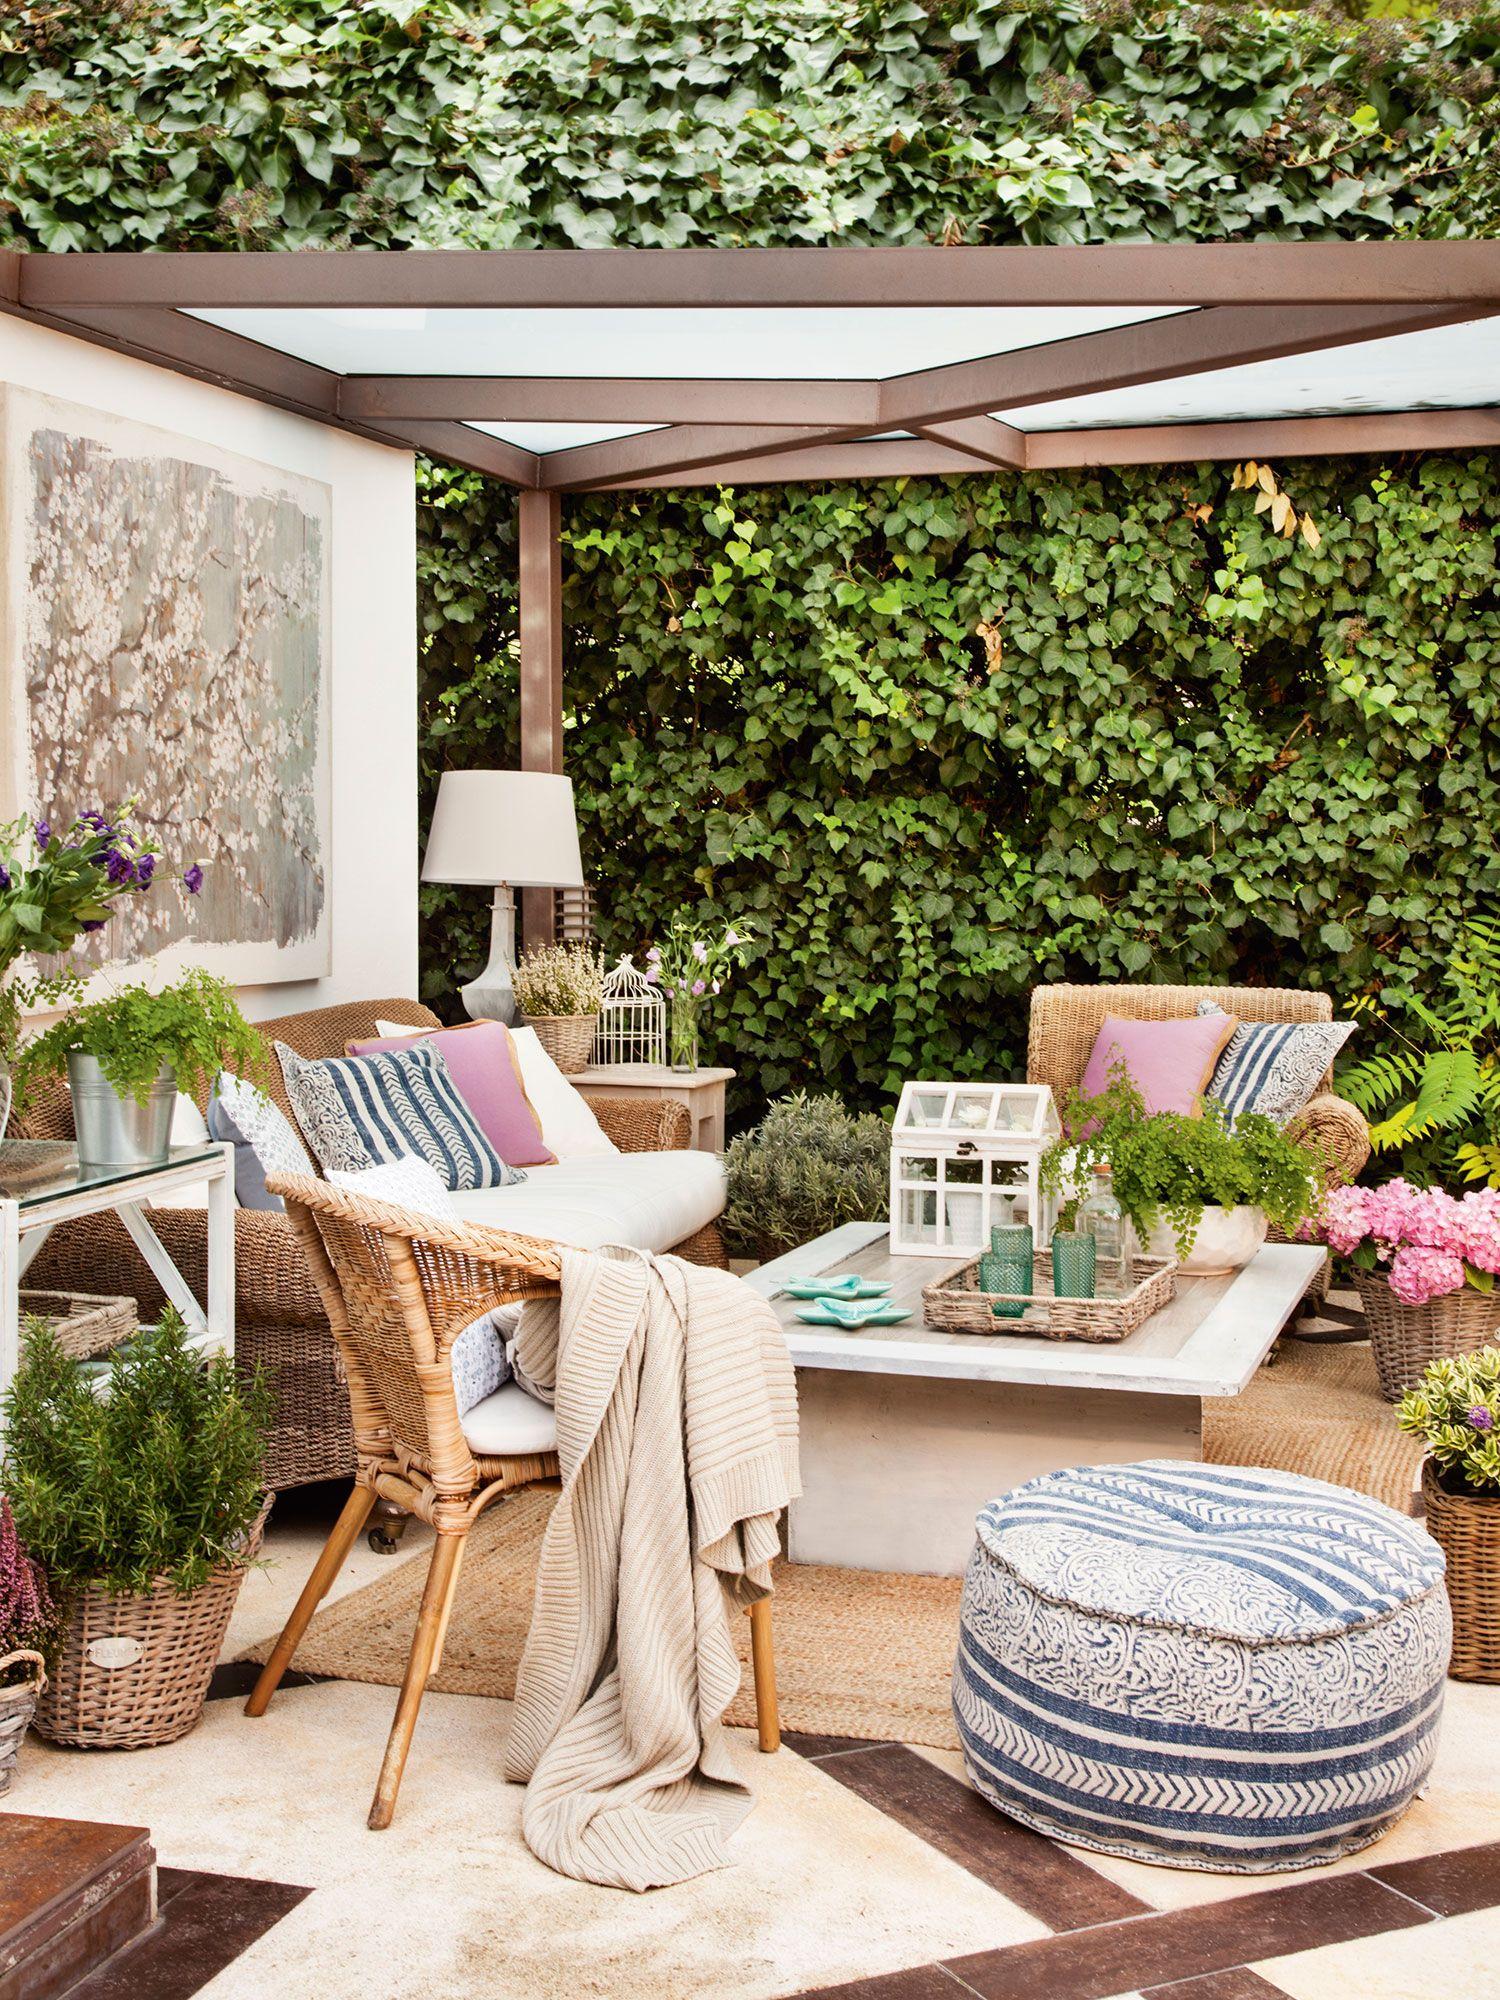 Sal n de verano en terraza con p rgola pinterest for Ideas jardines exteriores